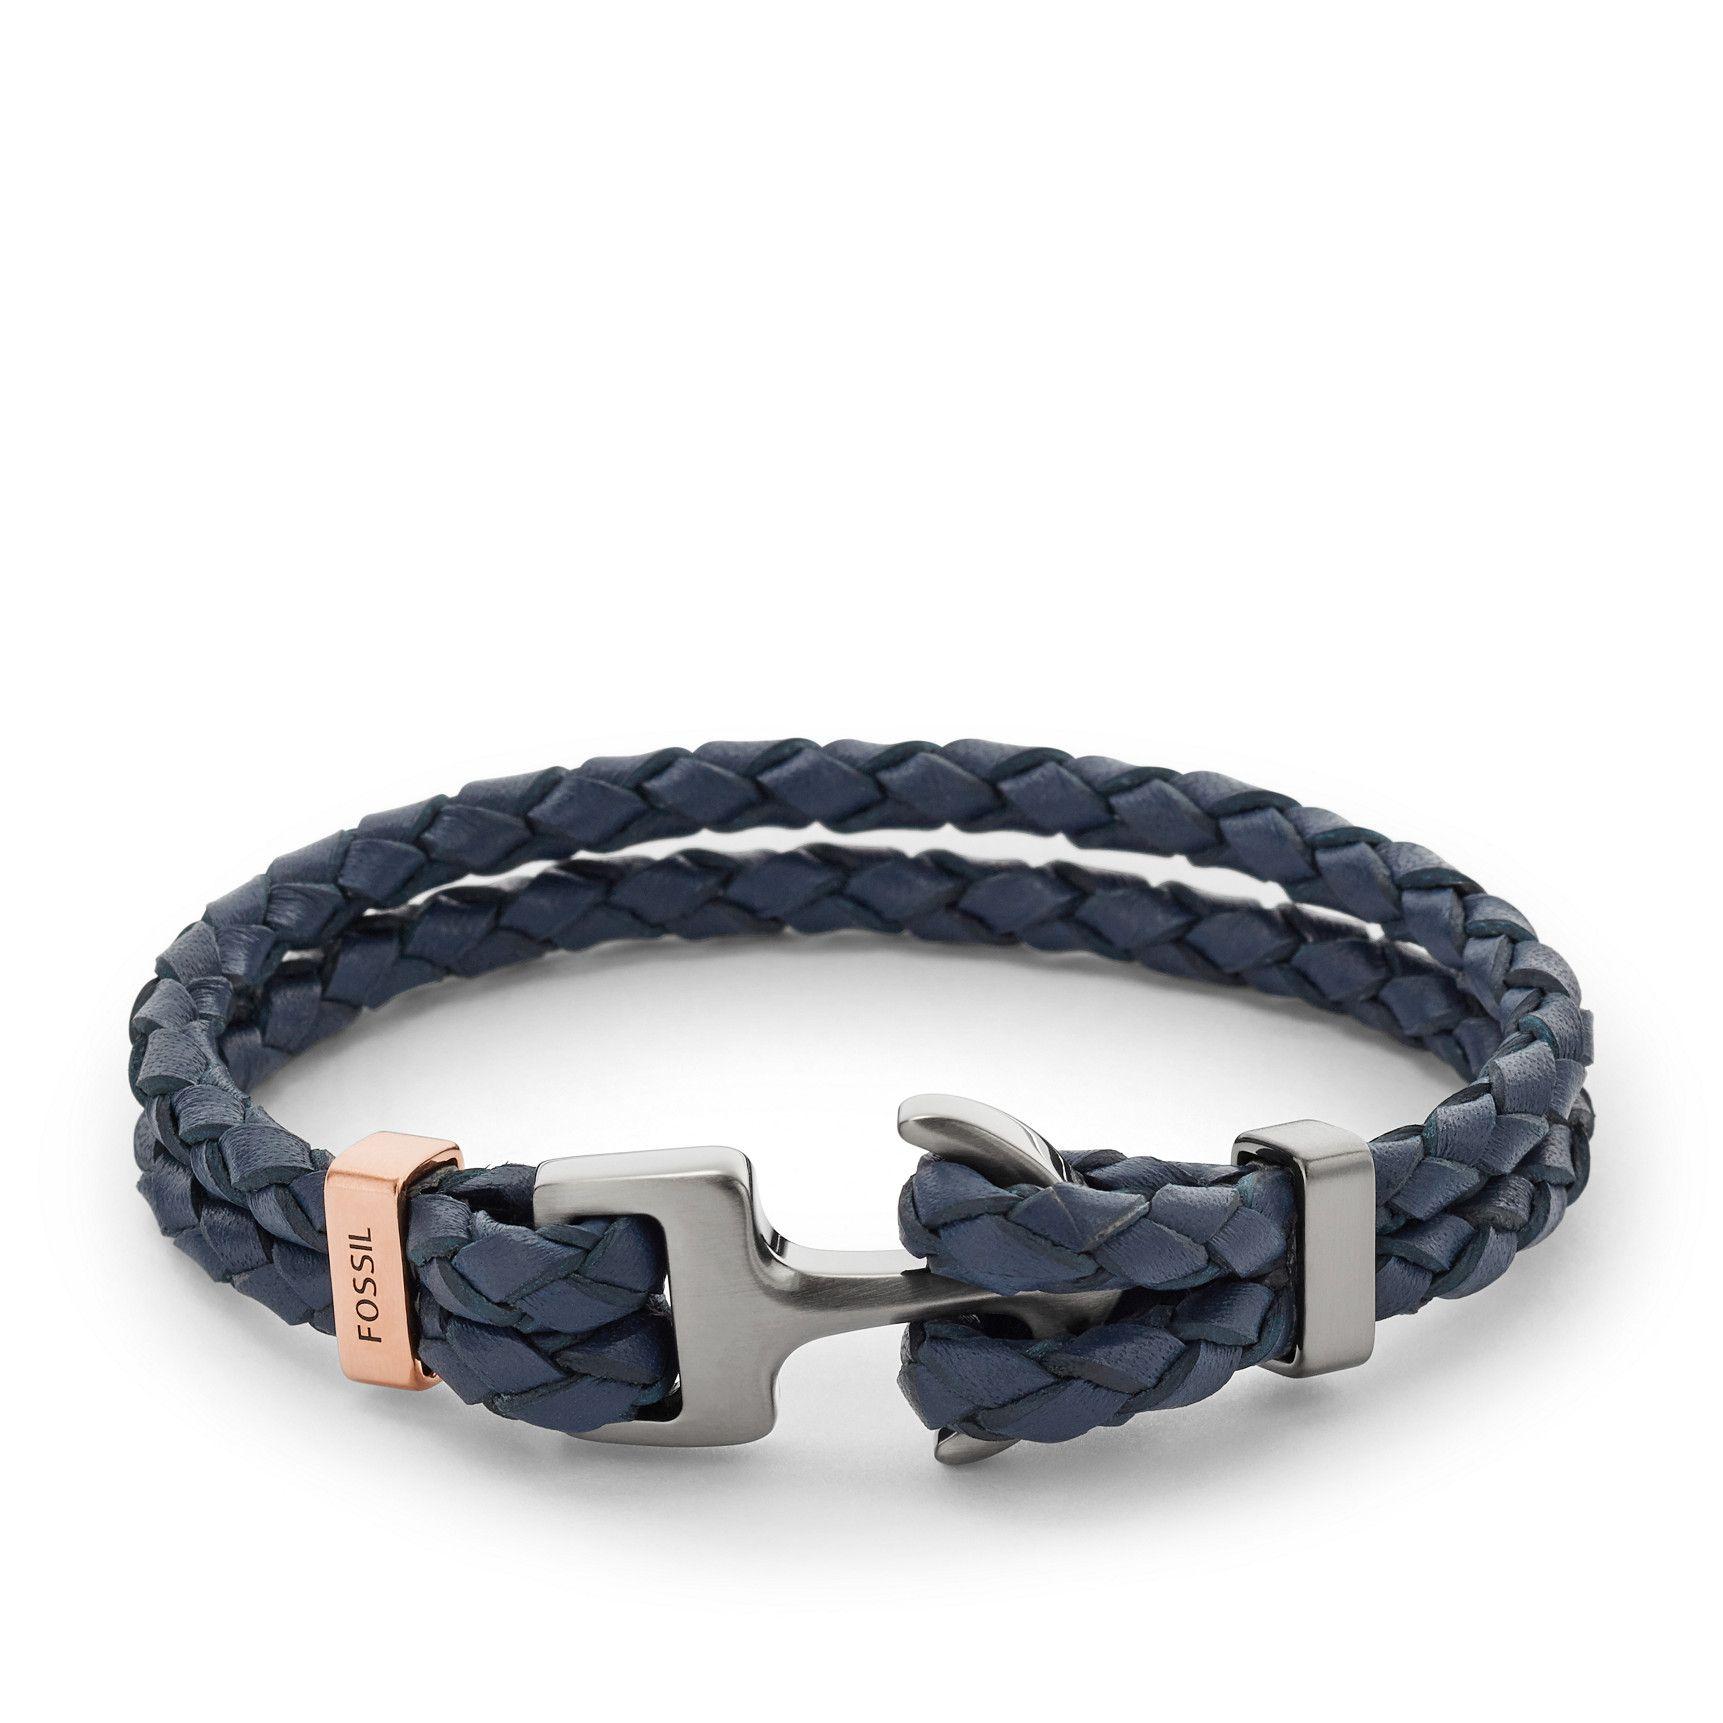 Bracelet Leather BrownRaw Fossil • Shape JTlKF1c